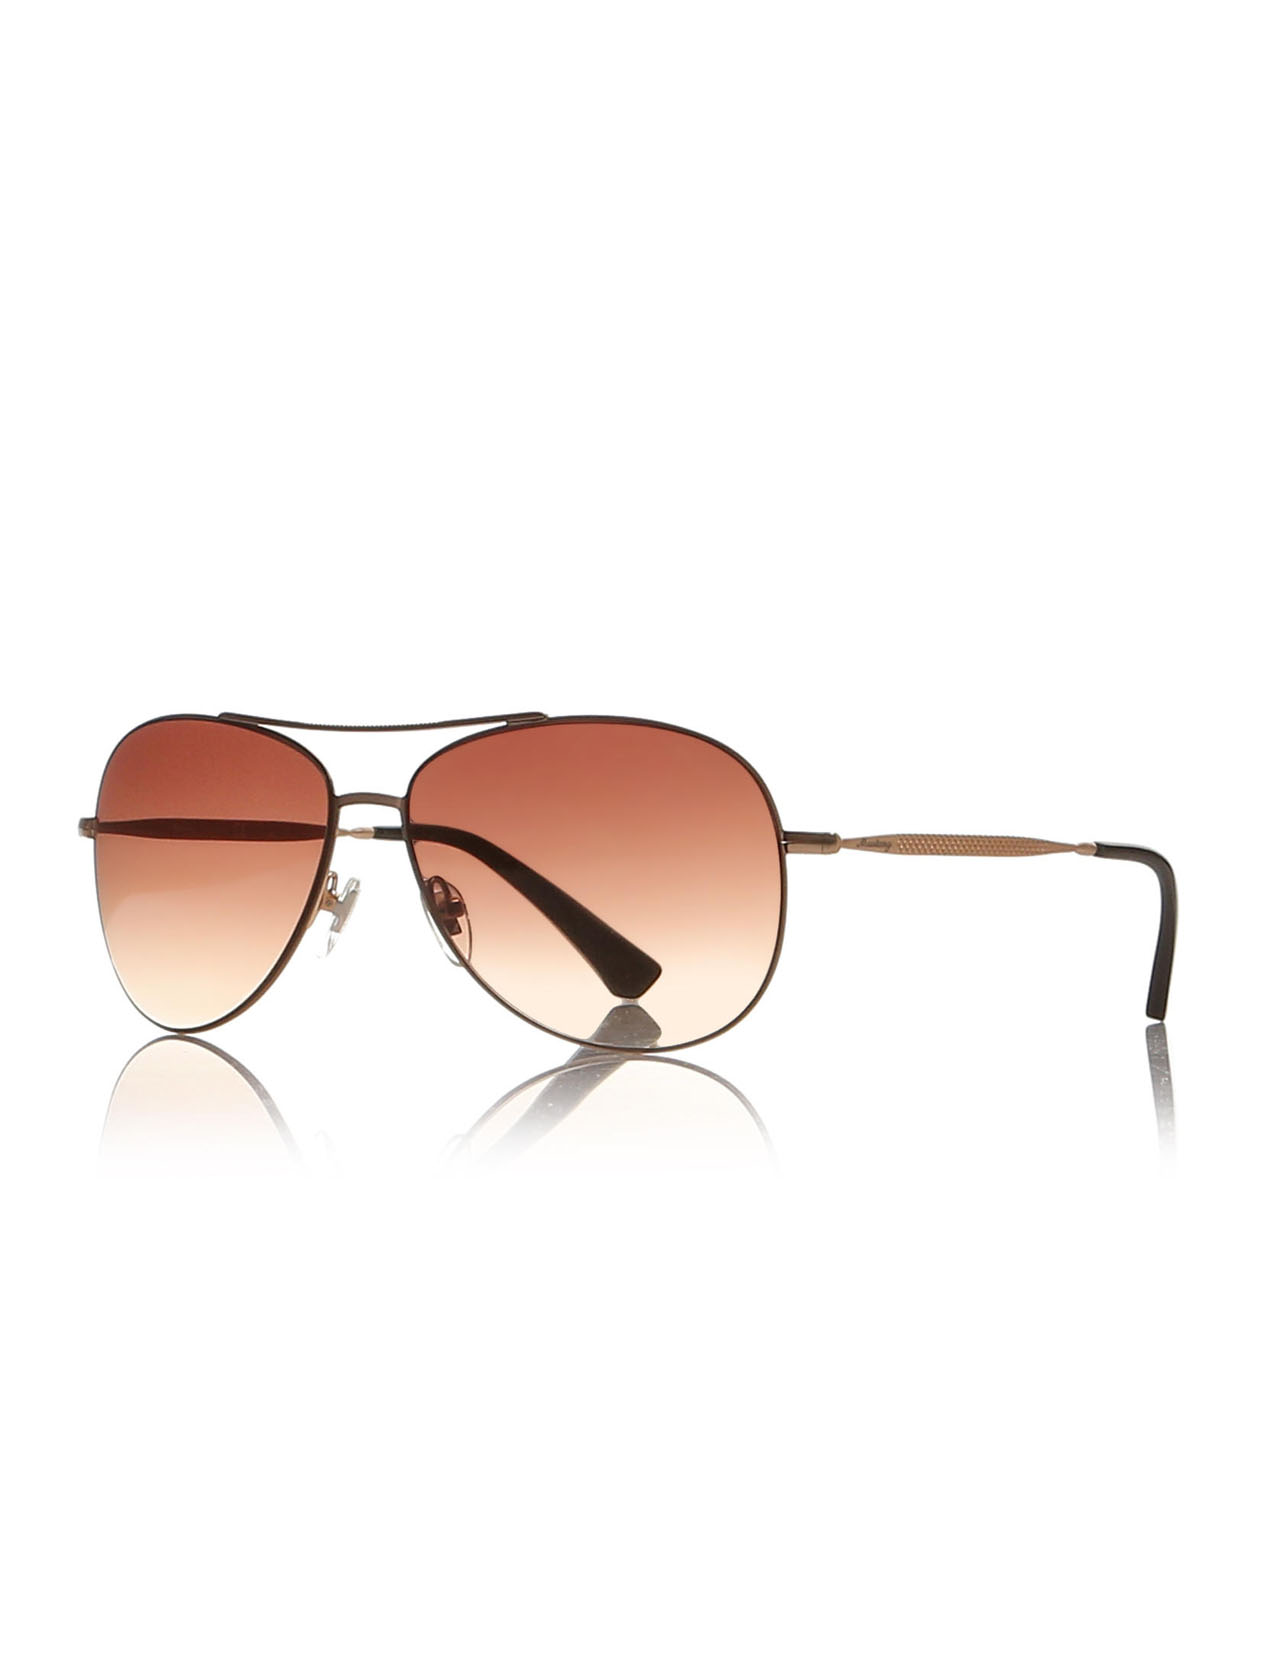 Men's sunglasses mu 1500 04 metal yellow organic 62 -- mustang